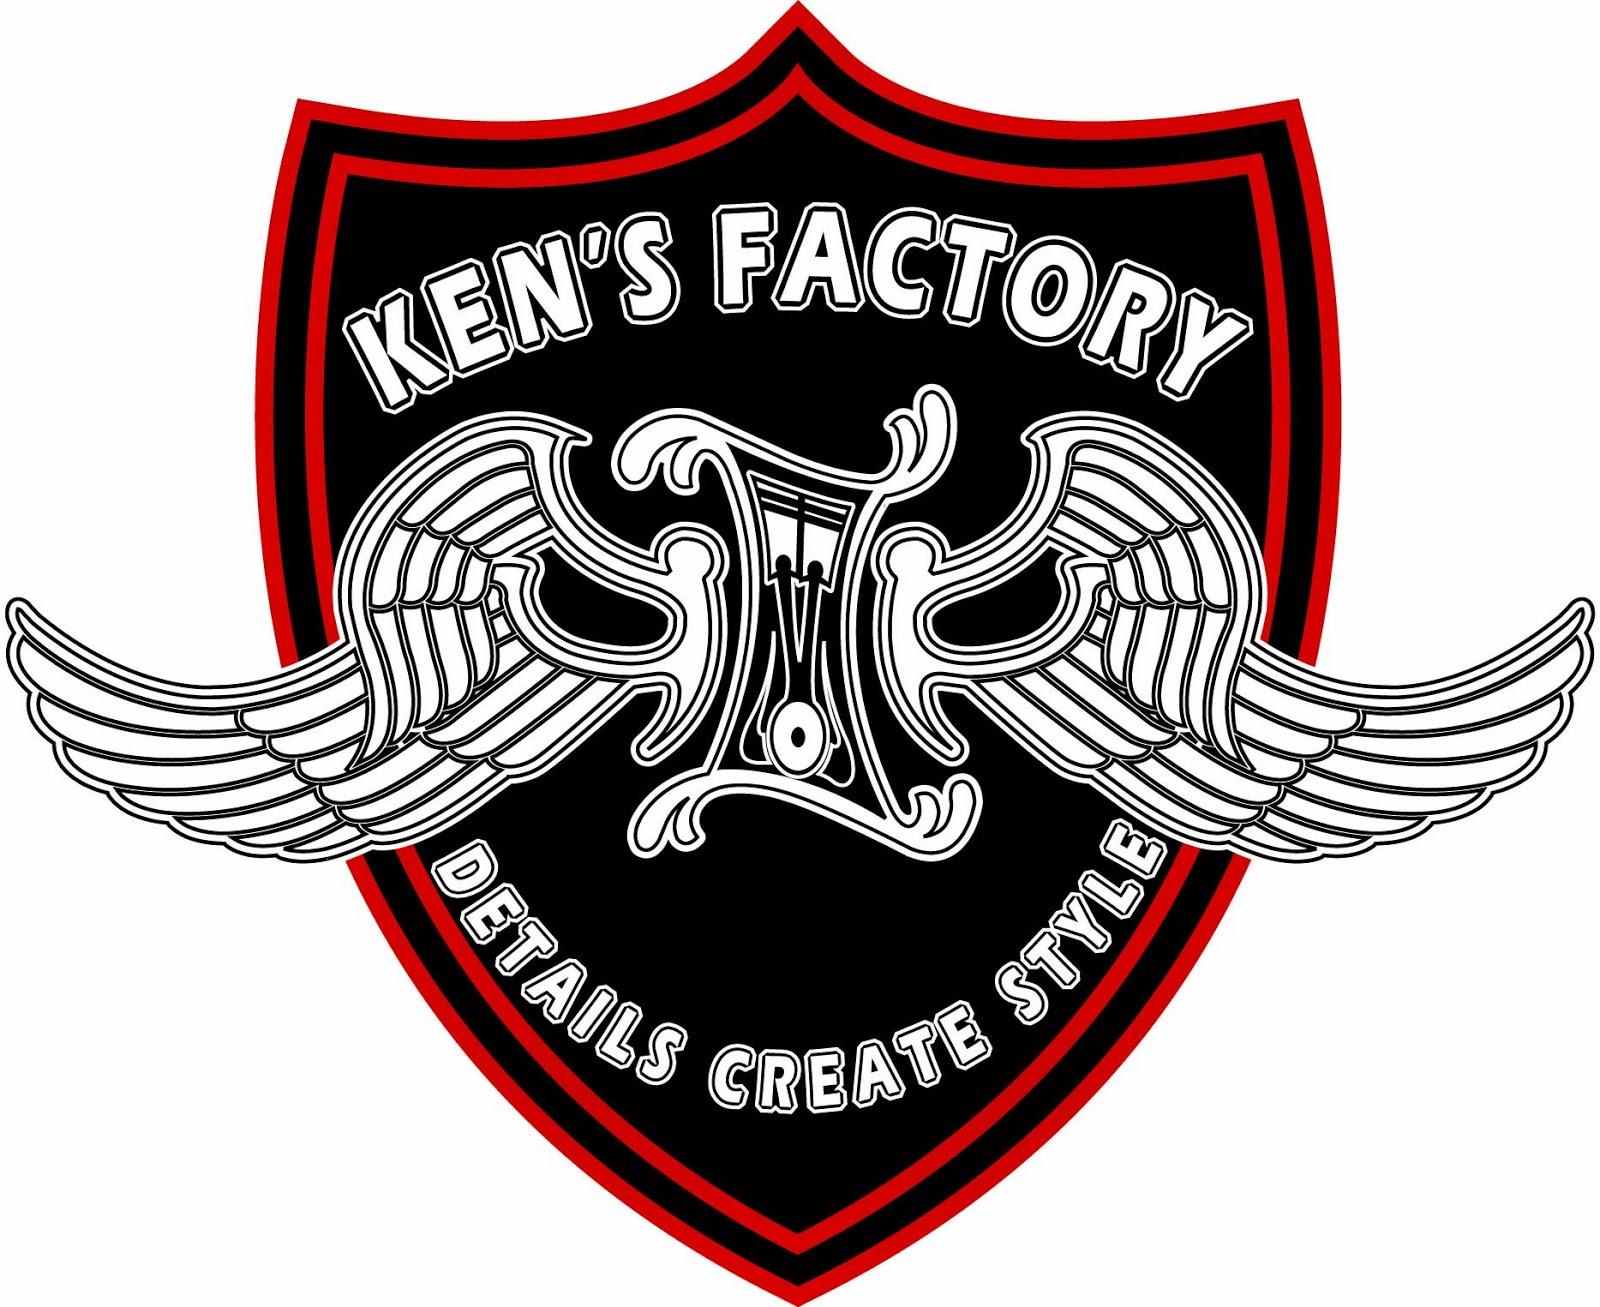 http://kens-factory.shop-pro.jp/